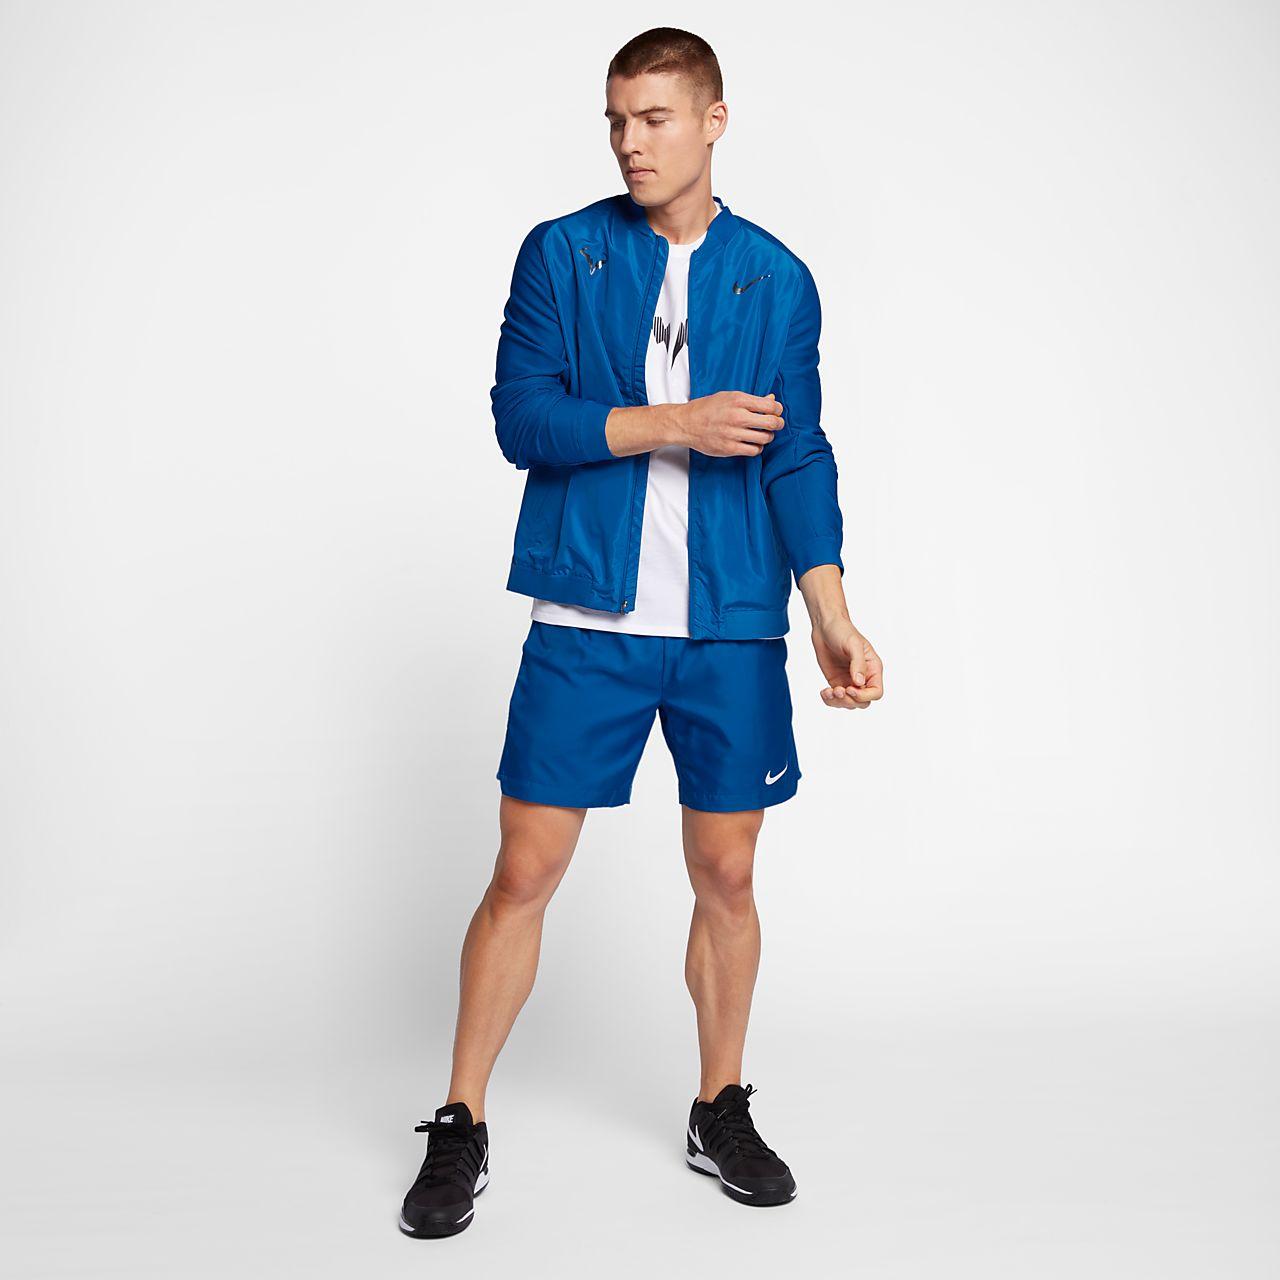 79096d36eaab NikeCourt Rafa Men s Tennis Jacket. Nike.com EG